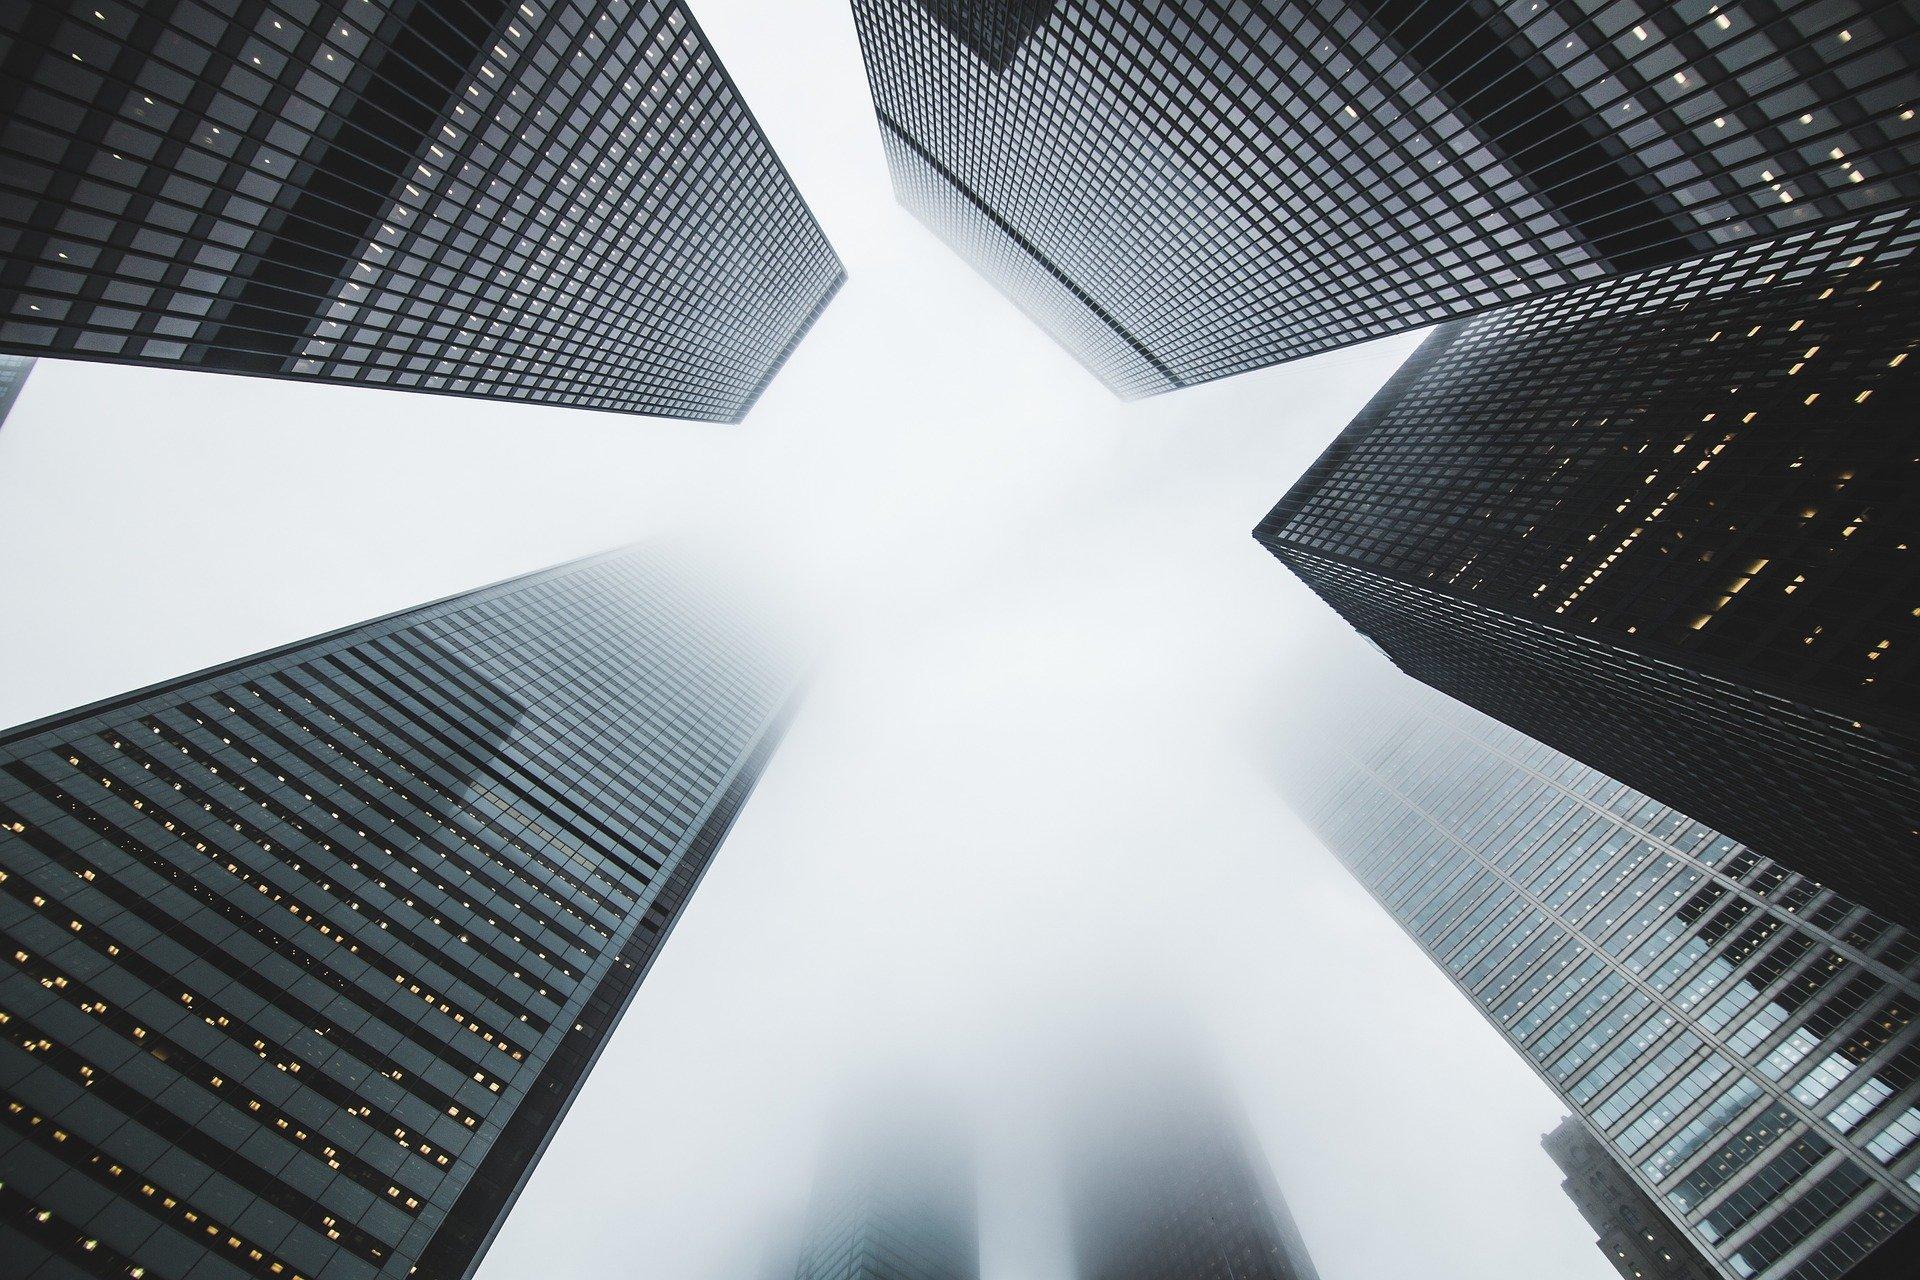 Sector inmobiliario estable para crecer en 1S de 2021